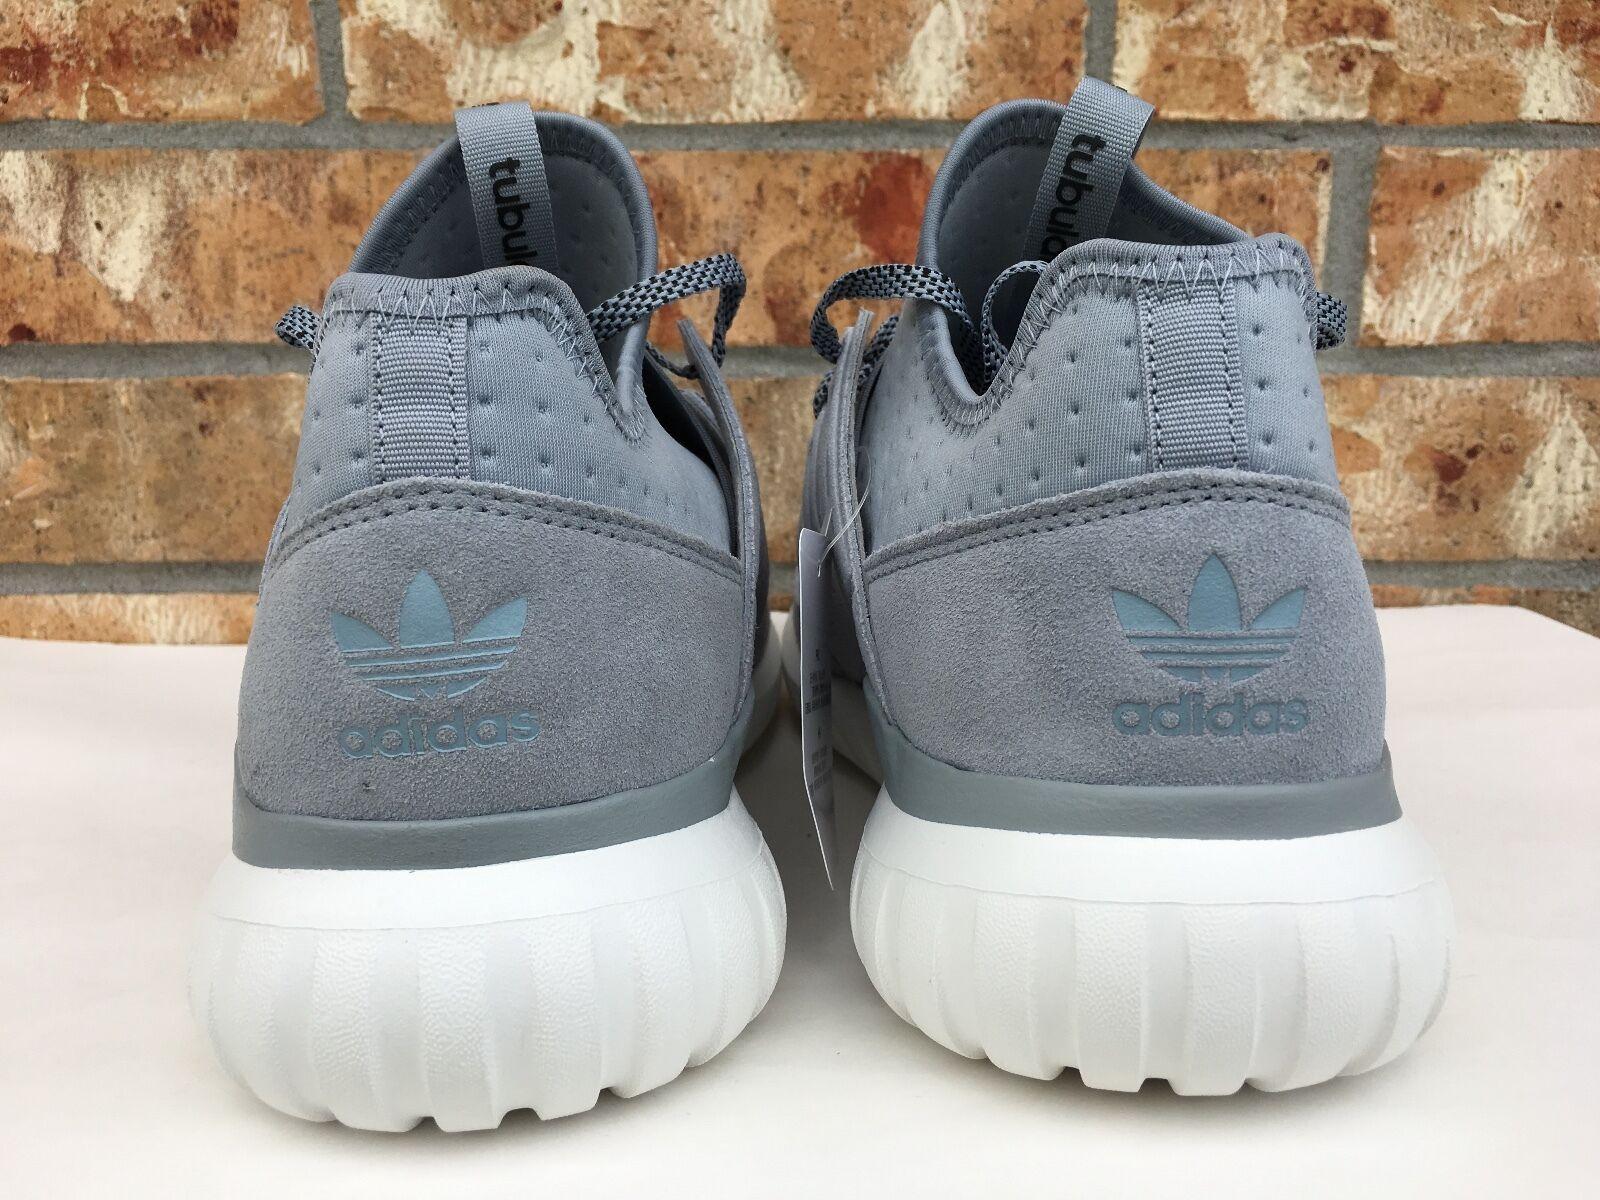 Gli uomini  adidas tubulare tubulare adidas radiale grigio chiaro nucleo nero vintage white sz 9.5-13 s80112 1b7673